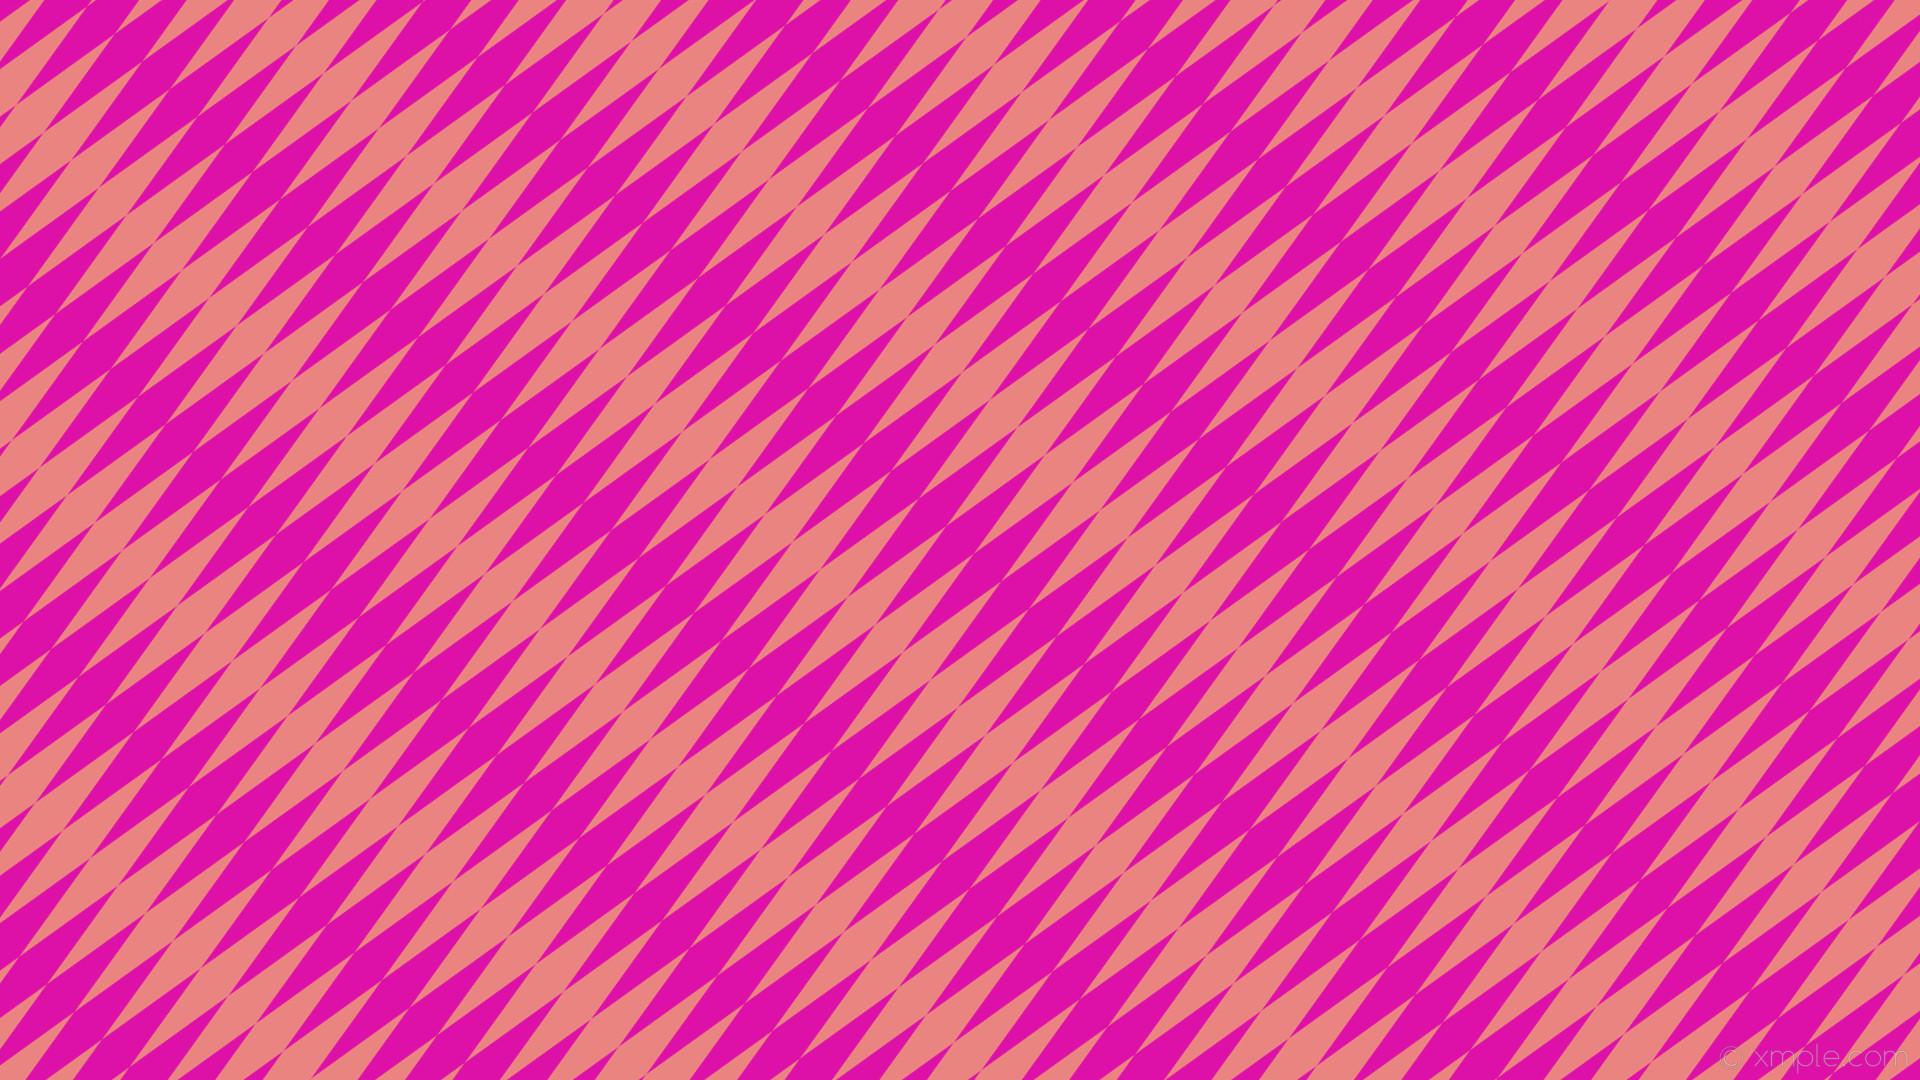 wallpaper lozenge rhombus pink diamond red #dd11a8 #ea8480 45° 240px 39px